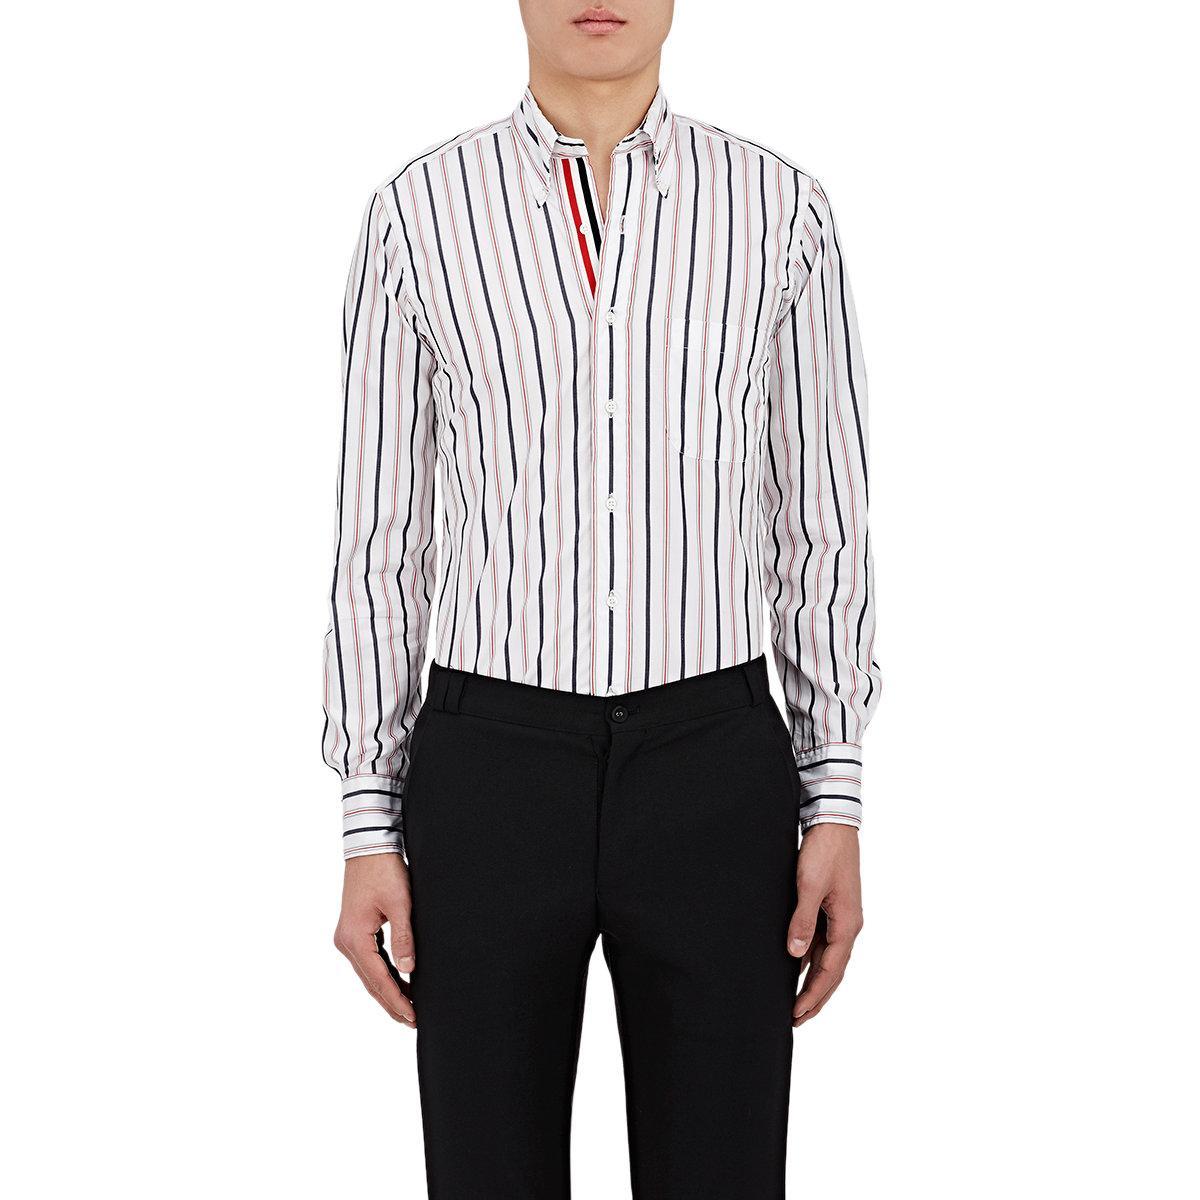 Thom browne striped broadcloth shirt in white for men lyst for Thom browne white shirt